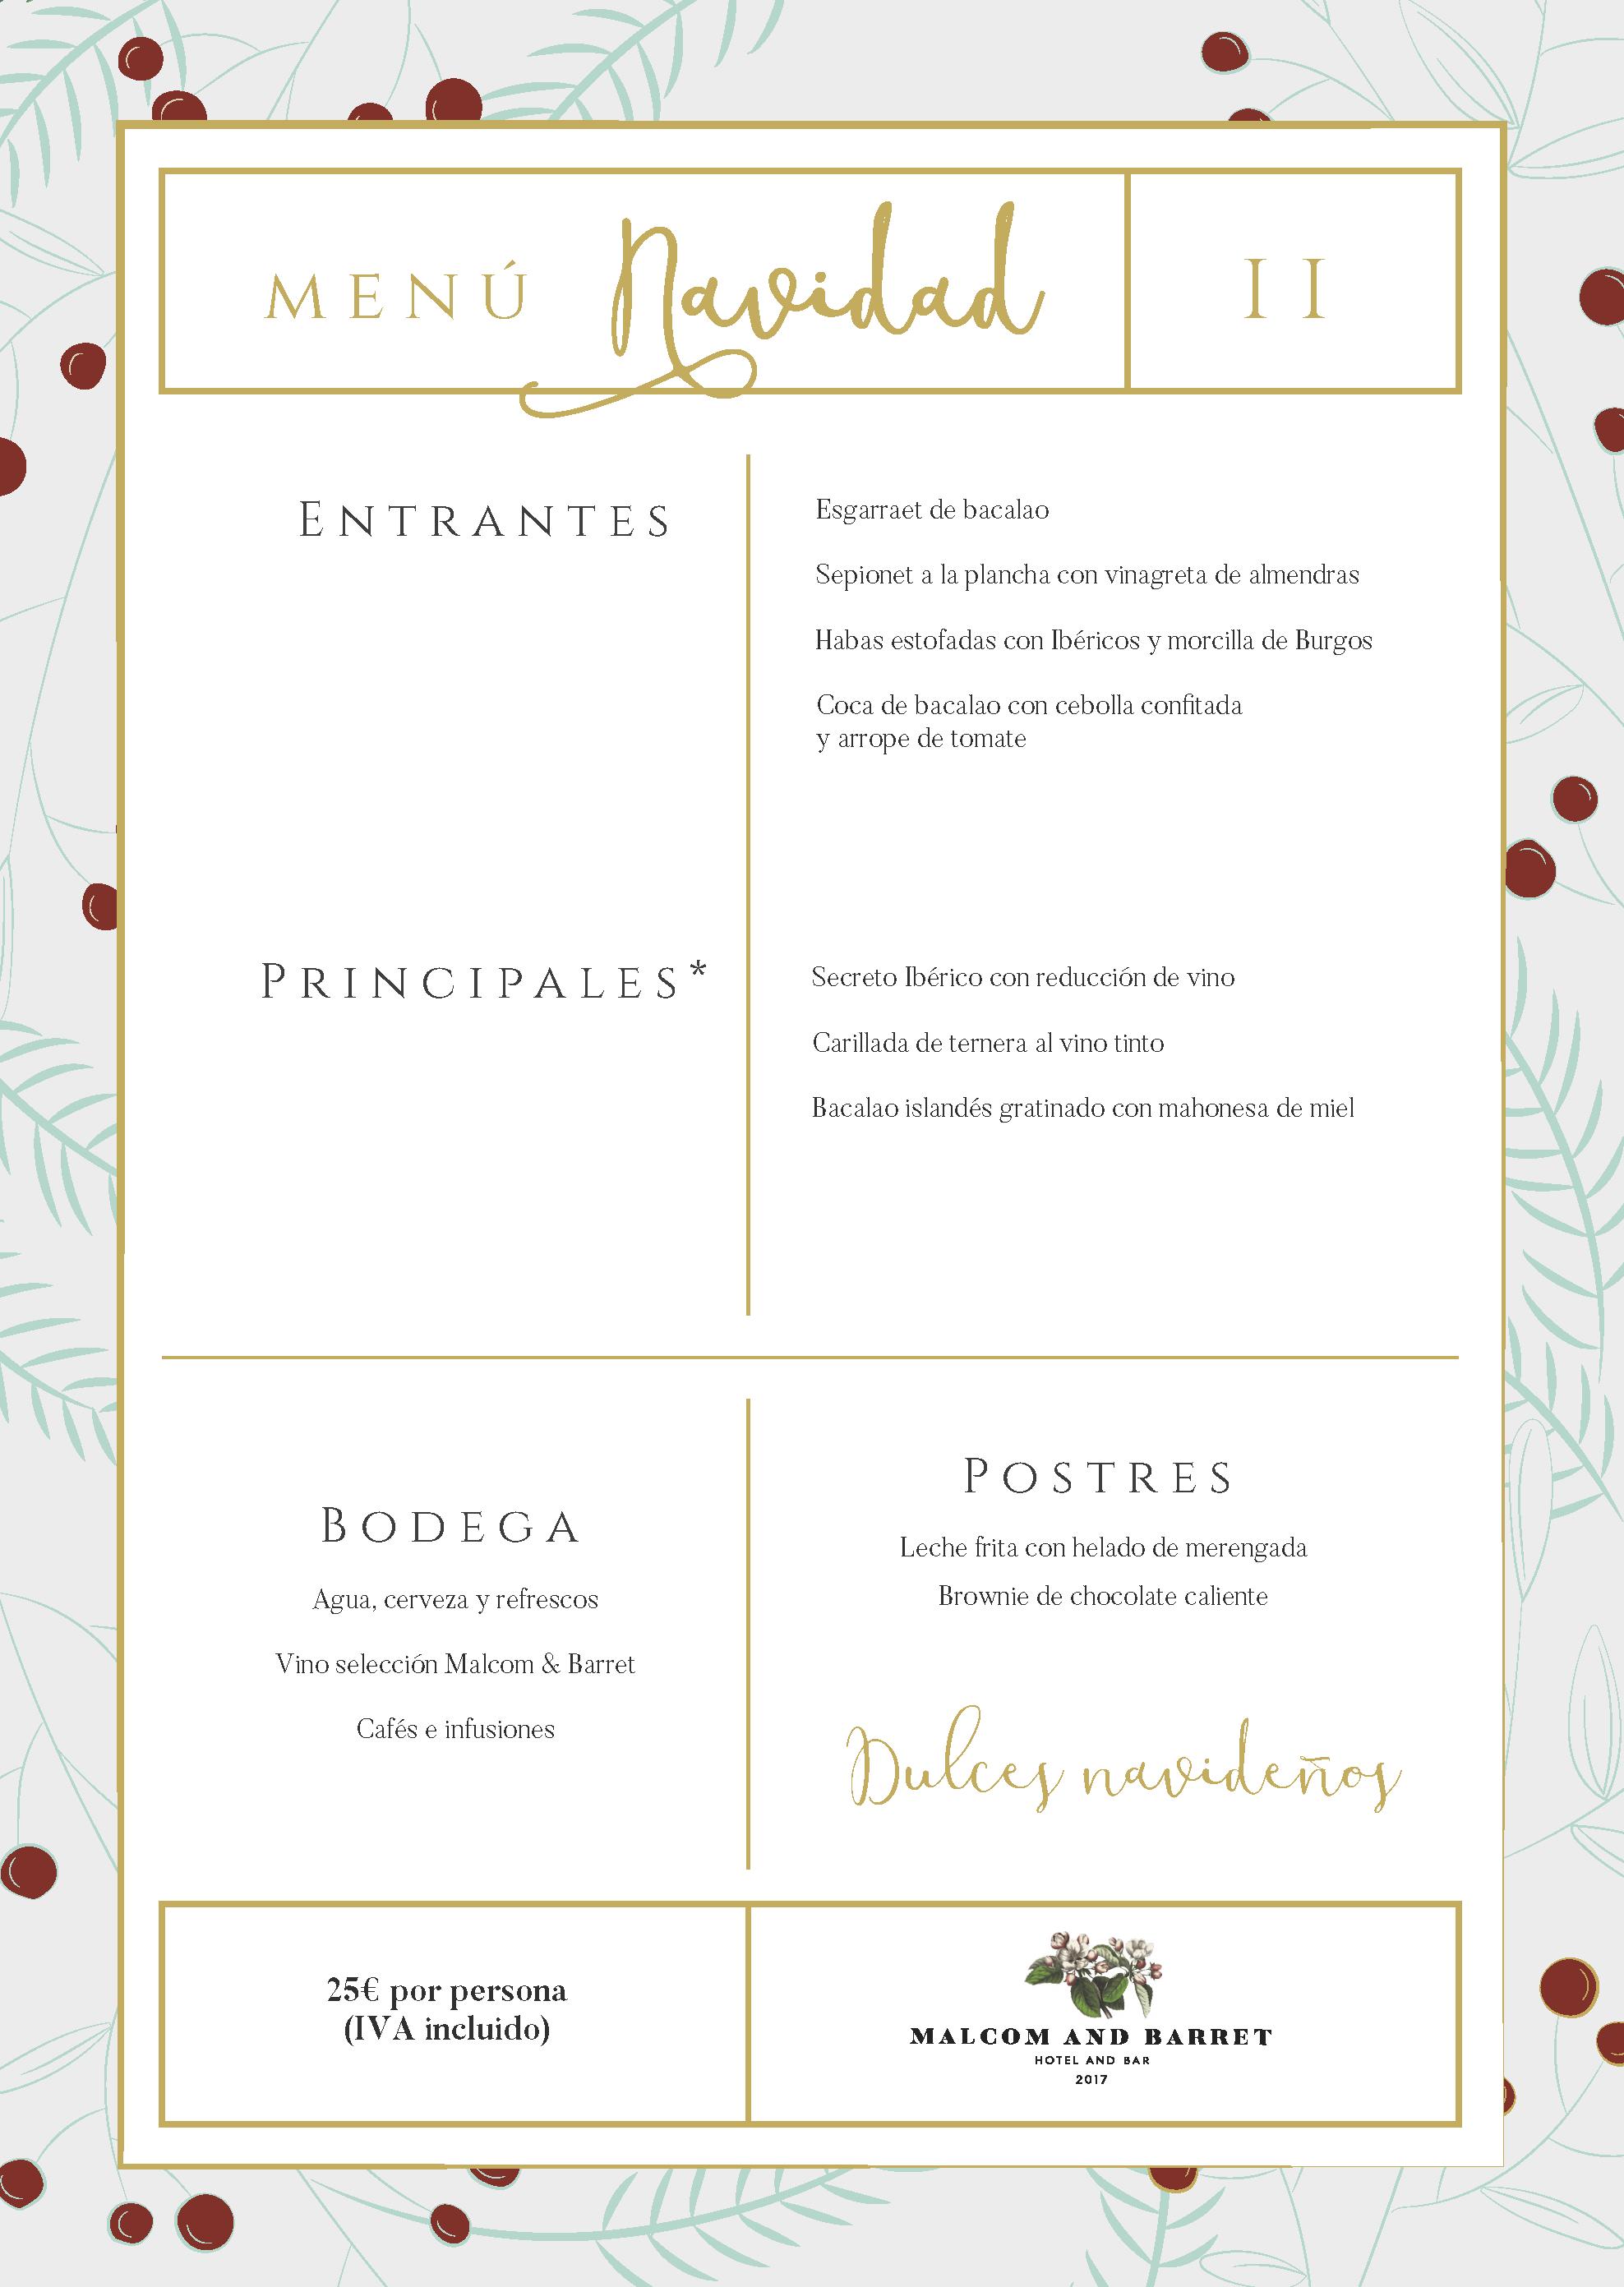 Menú Grupo Navidad Malcom and Barret ES (1)_Página_3